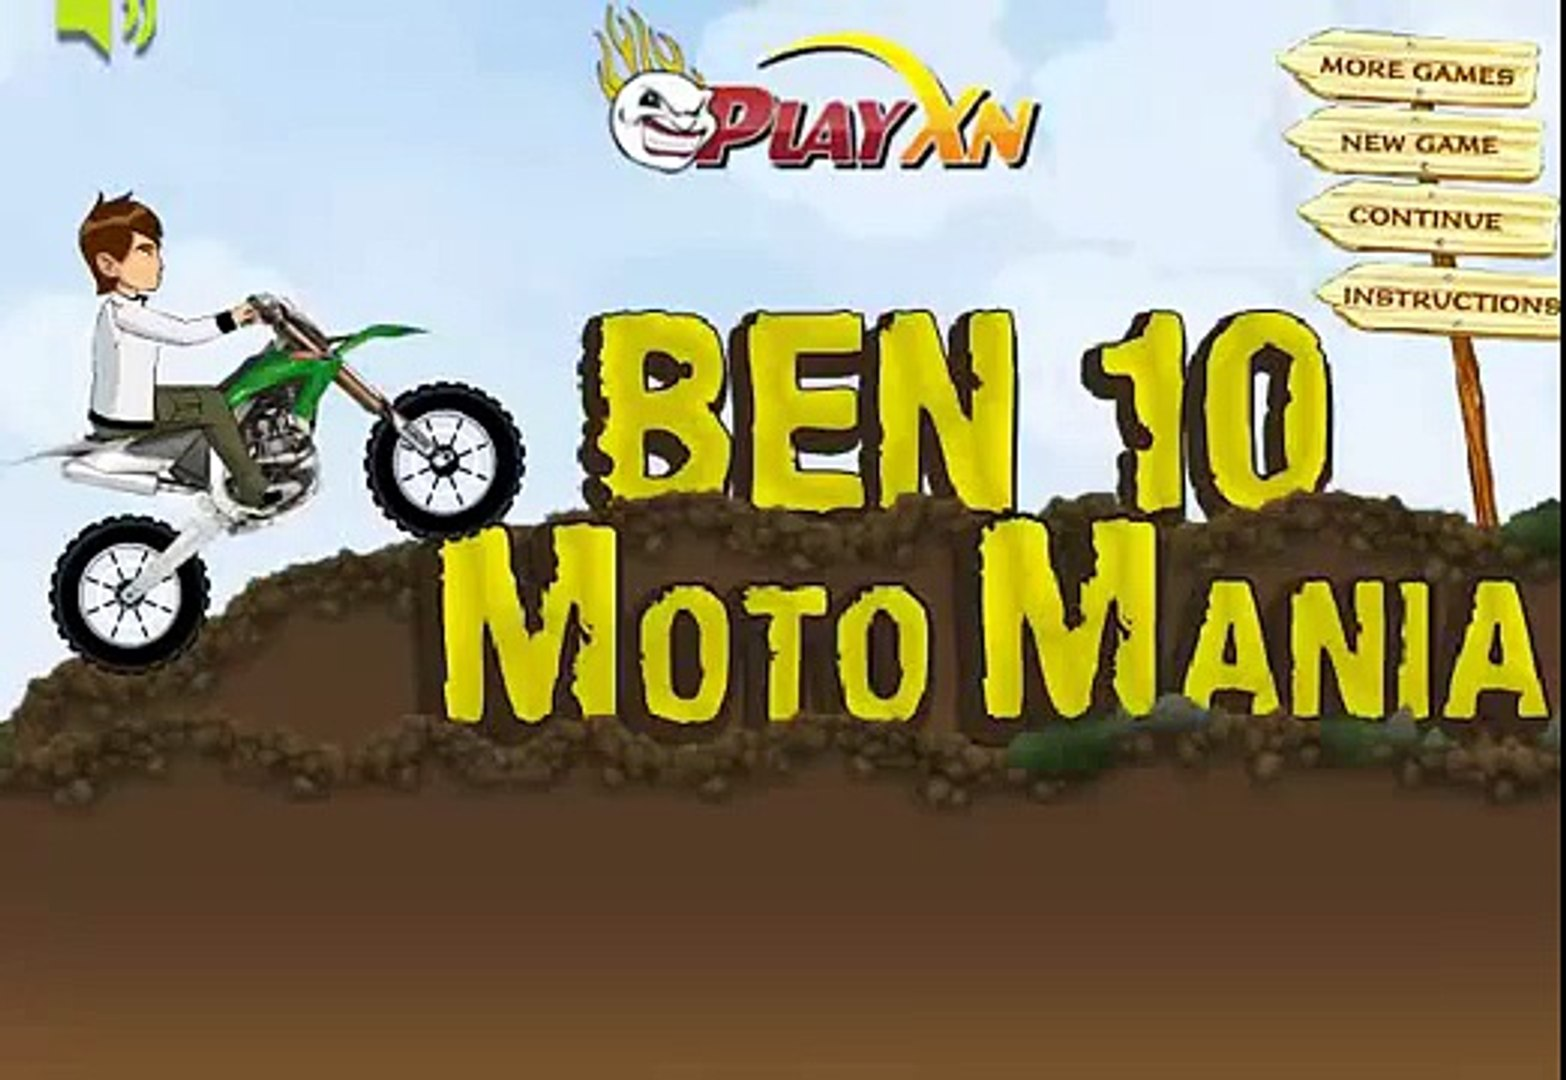 Ben 10 Moto Mania - Ben 10 Racing Game